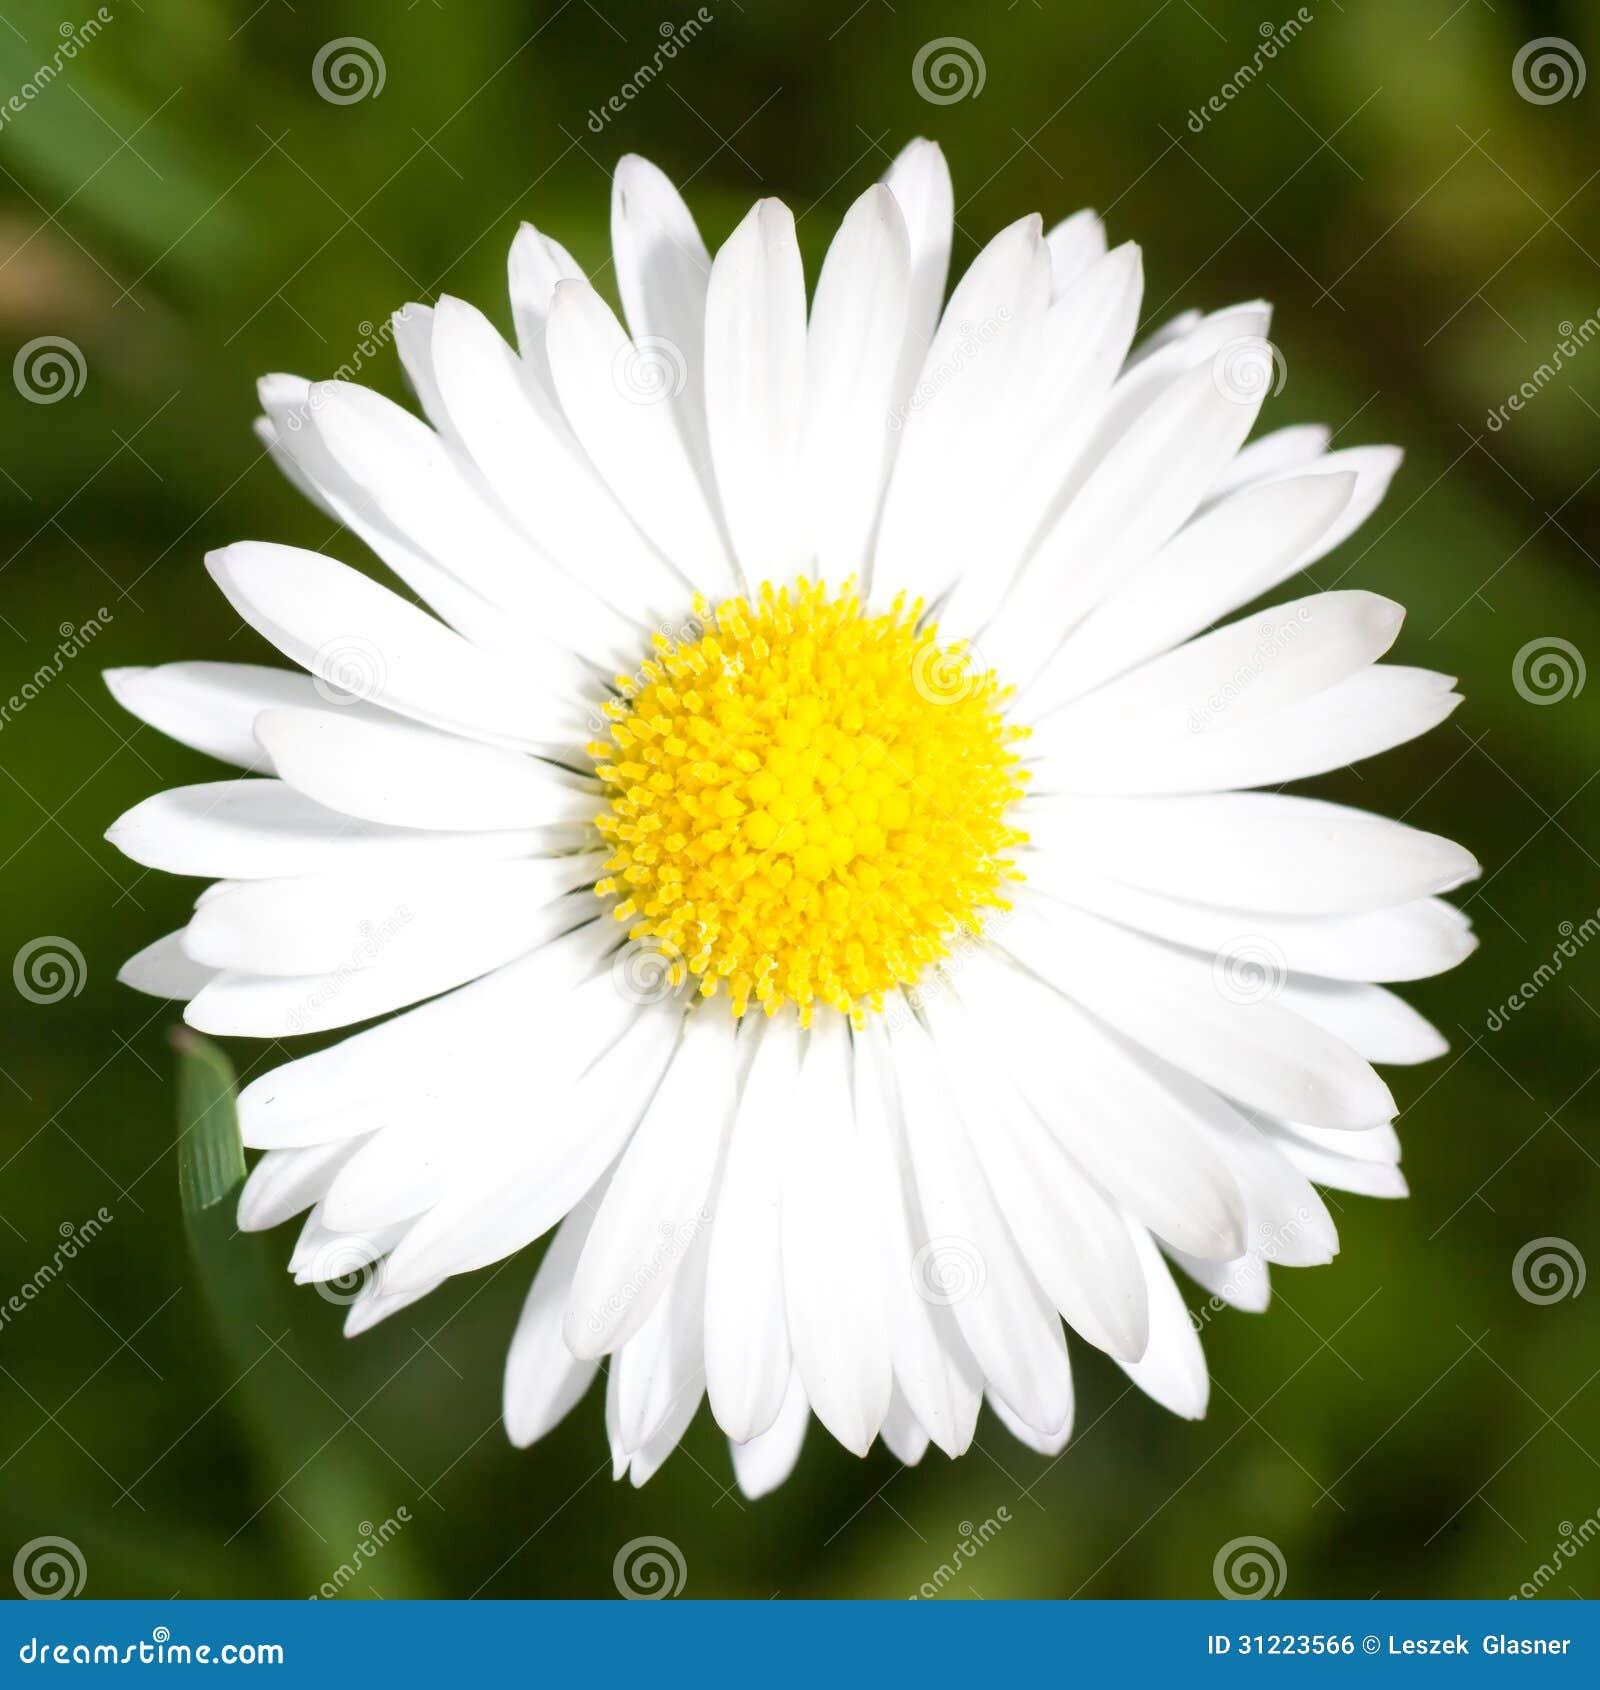 Macro de fleur de marguerite daisy image libre de droits - Image fleur marguerite ...